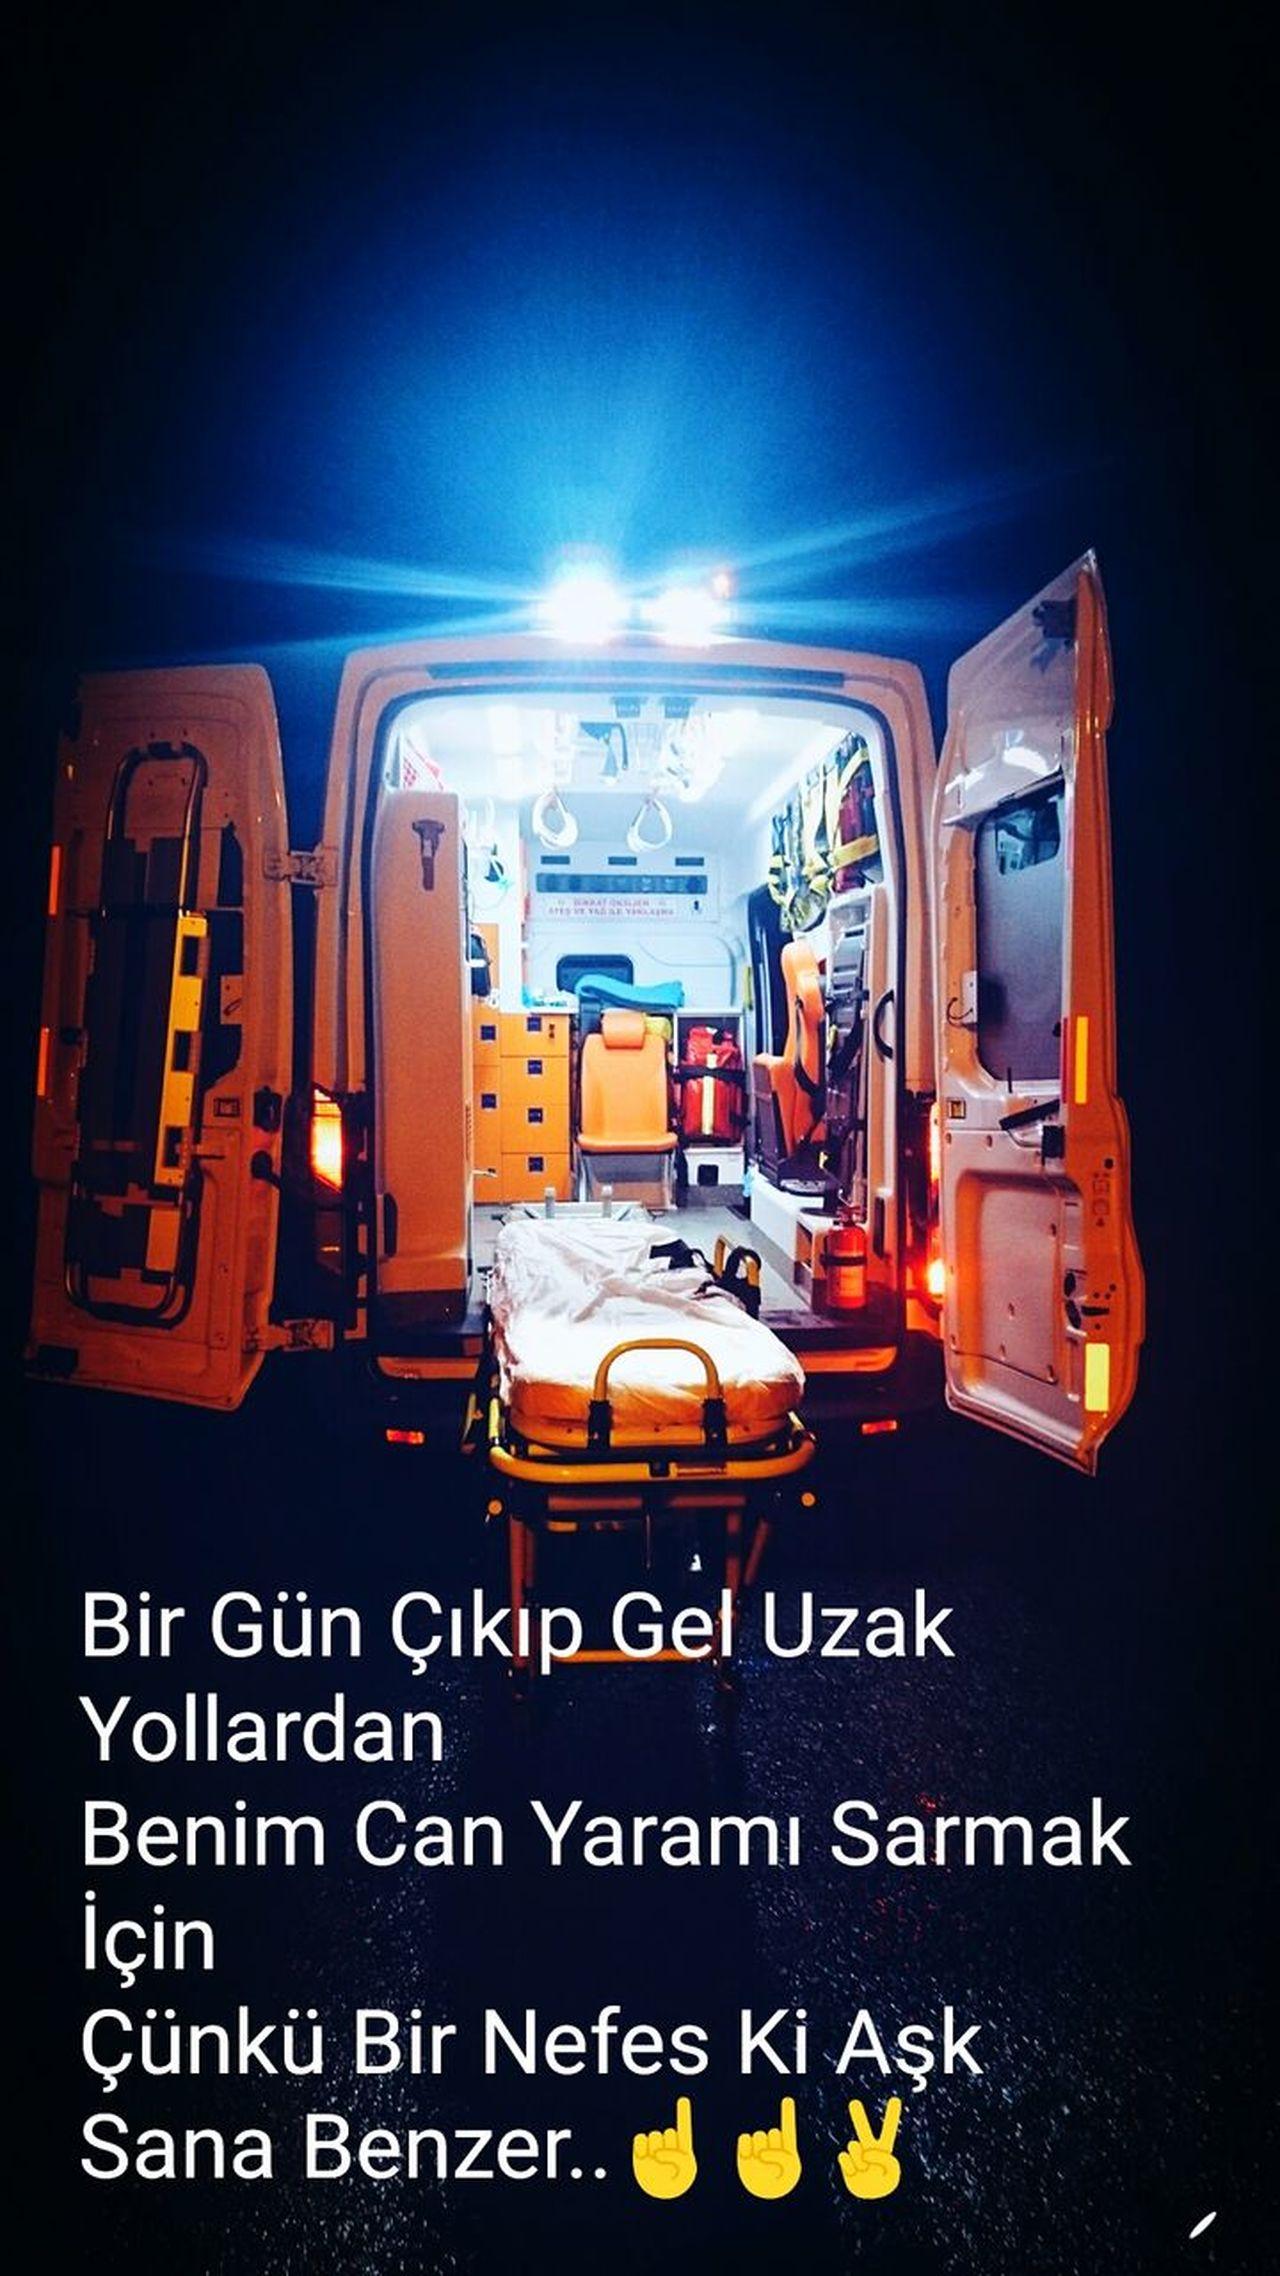 En Güzel Aşk ☝☝✌ 😚 Lady Driver Emergency Turkey Att Kırmızı şeritli 112 Rize 53